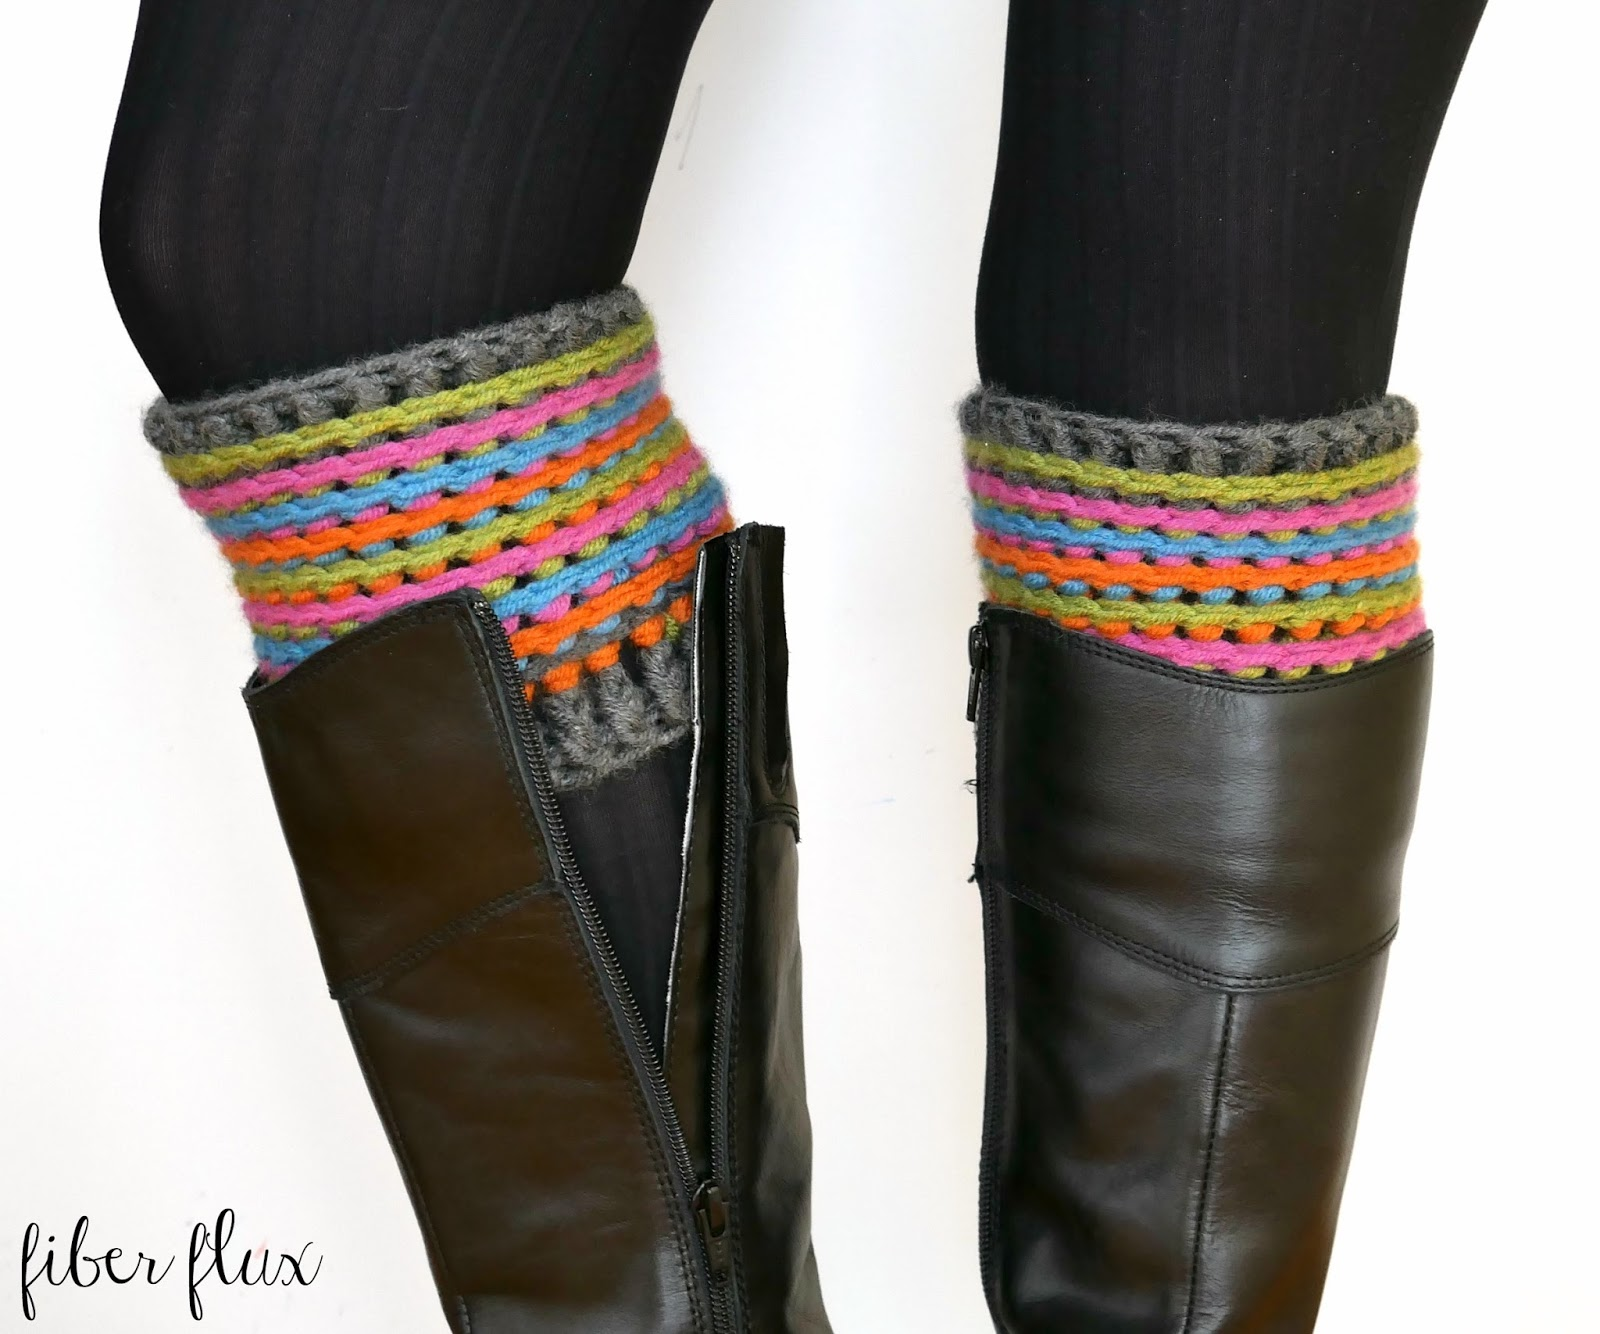 Fiber flux free crochet patterncelebration boot cuffs free crochet patterncelebration boot cuffs bankloansurffo Images